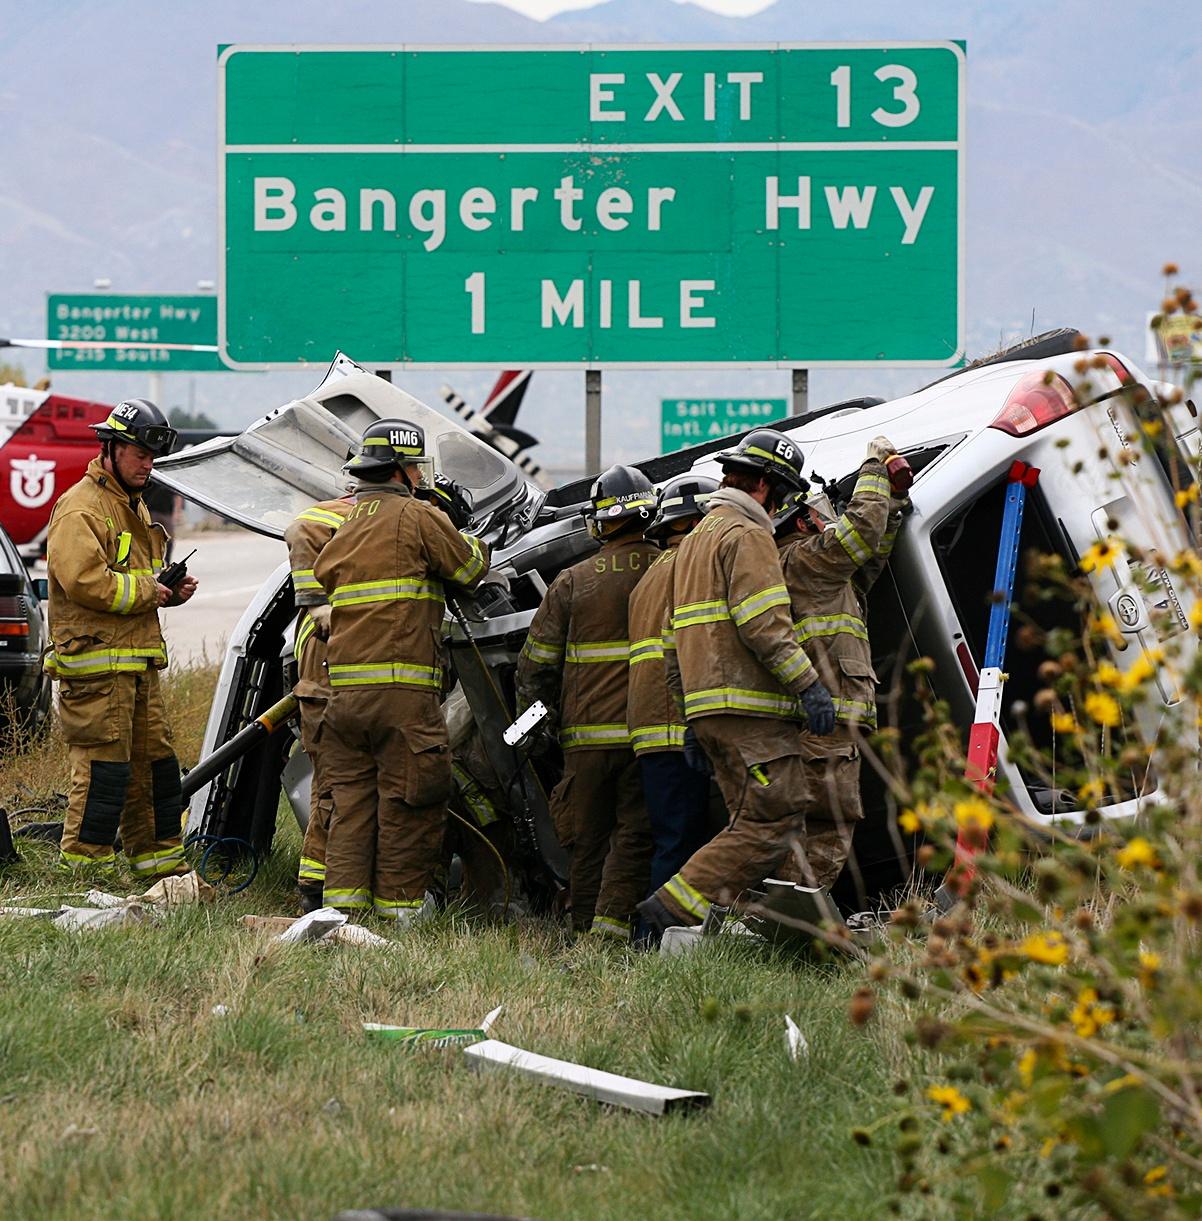 Troy Hagen_Incident Management_Traffic Accident.jpg